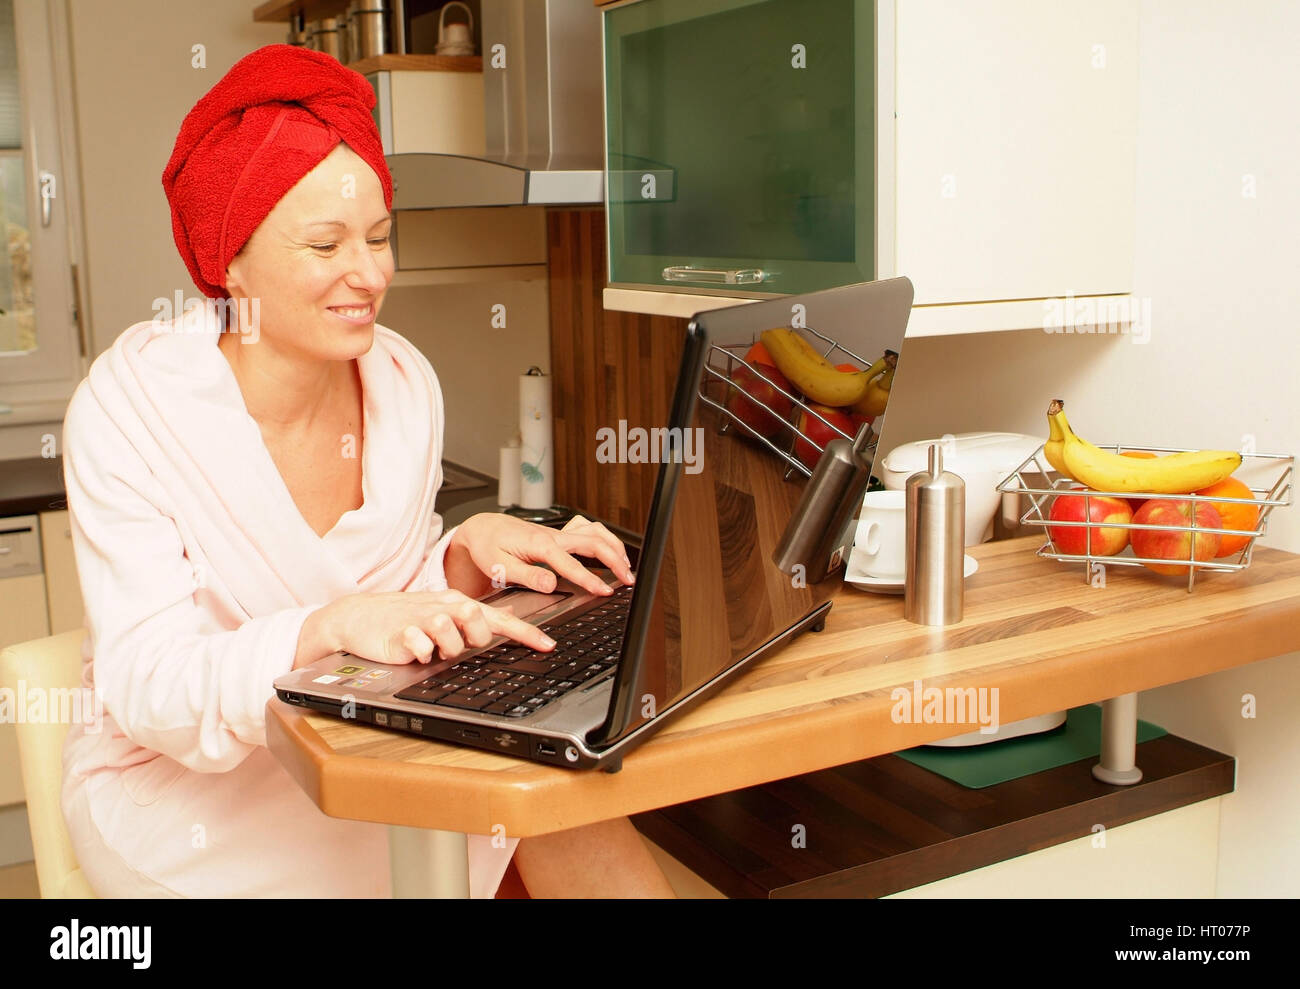 Junge Frau im Morgenmantel arbeitet am Notebook in der Kueche - woman in bath robe using laptop in kitchen - Stock Image